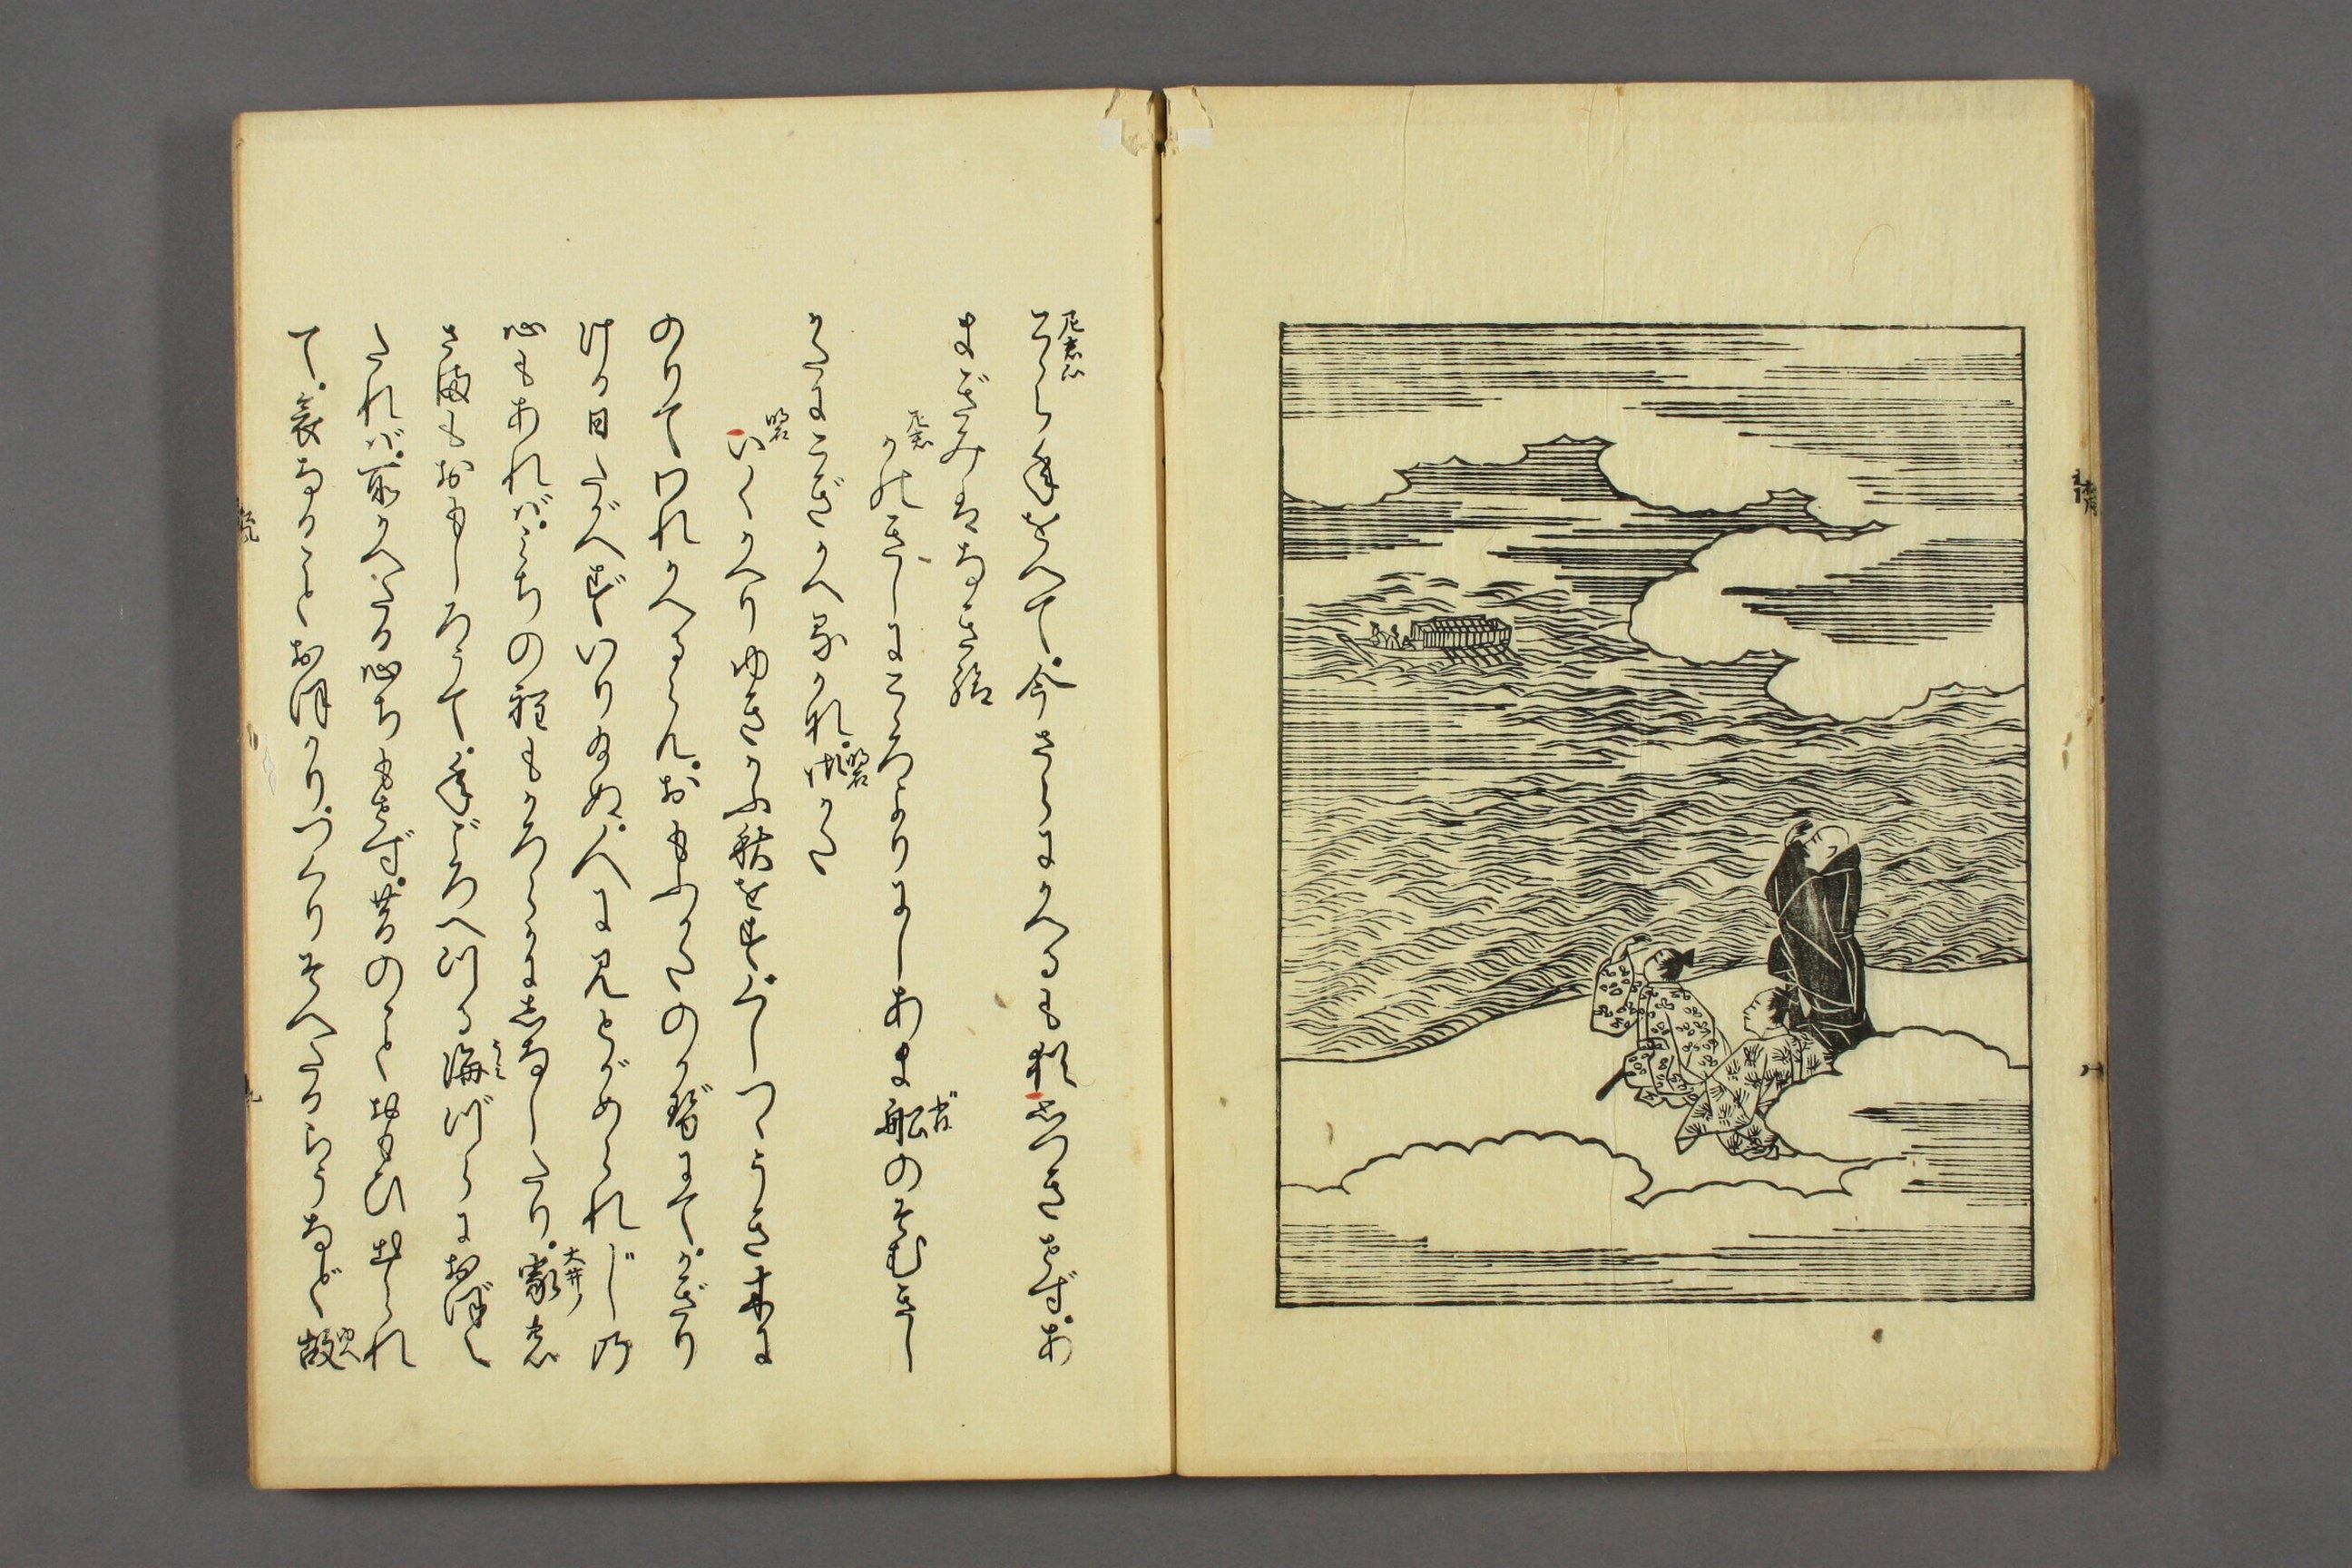 http://archive.wul.waseda.ac.jp/kosho/bunko30/bunko30_a0007/bunko30_a0007_0018/bunko30_a0007_0018_p0010.jpg